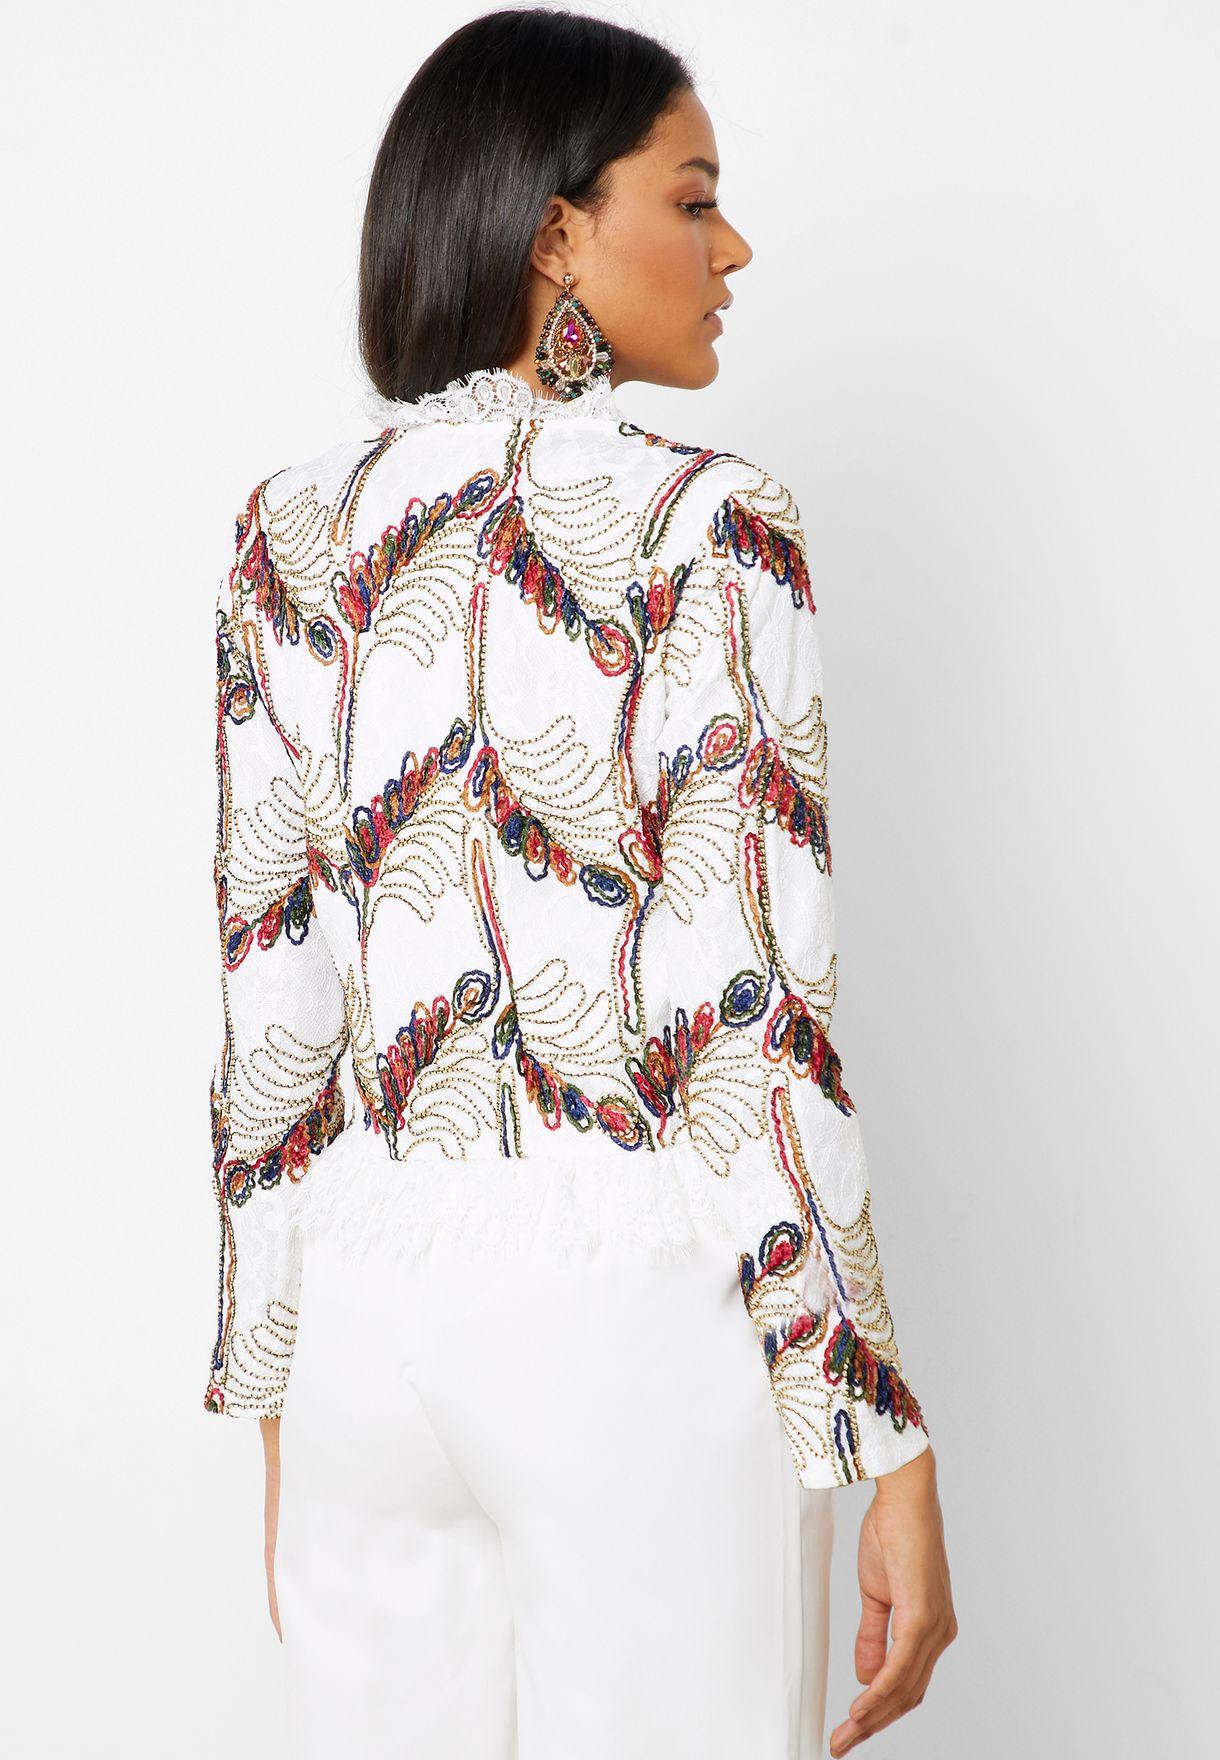 Embroidered Fringe Top